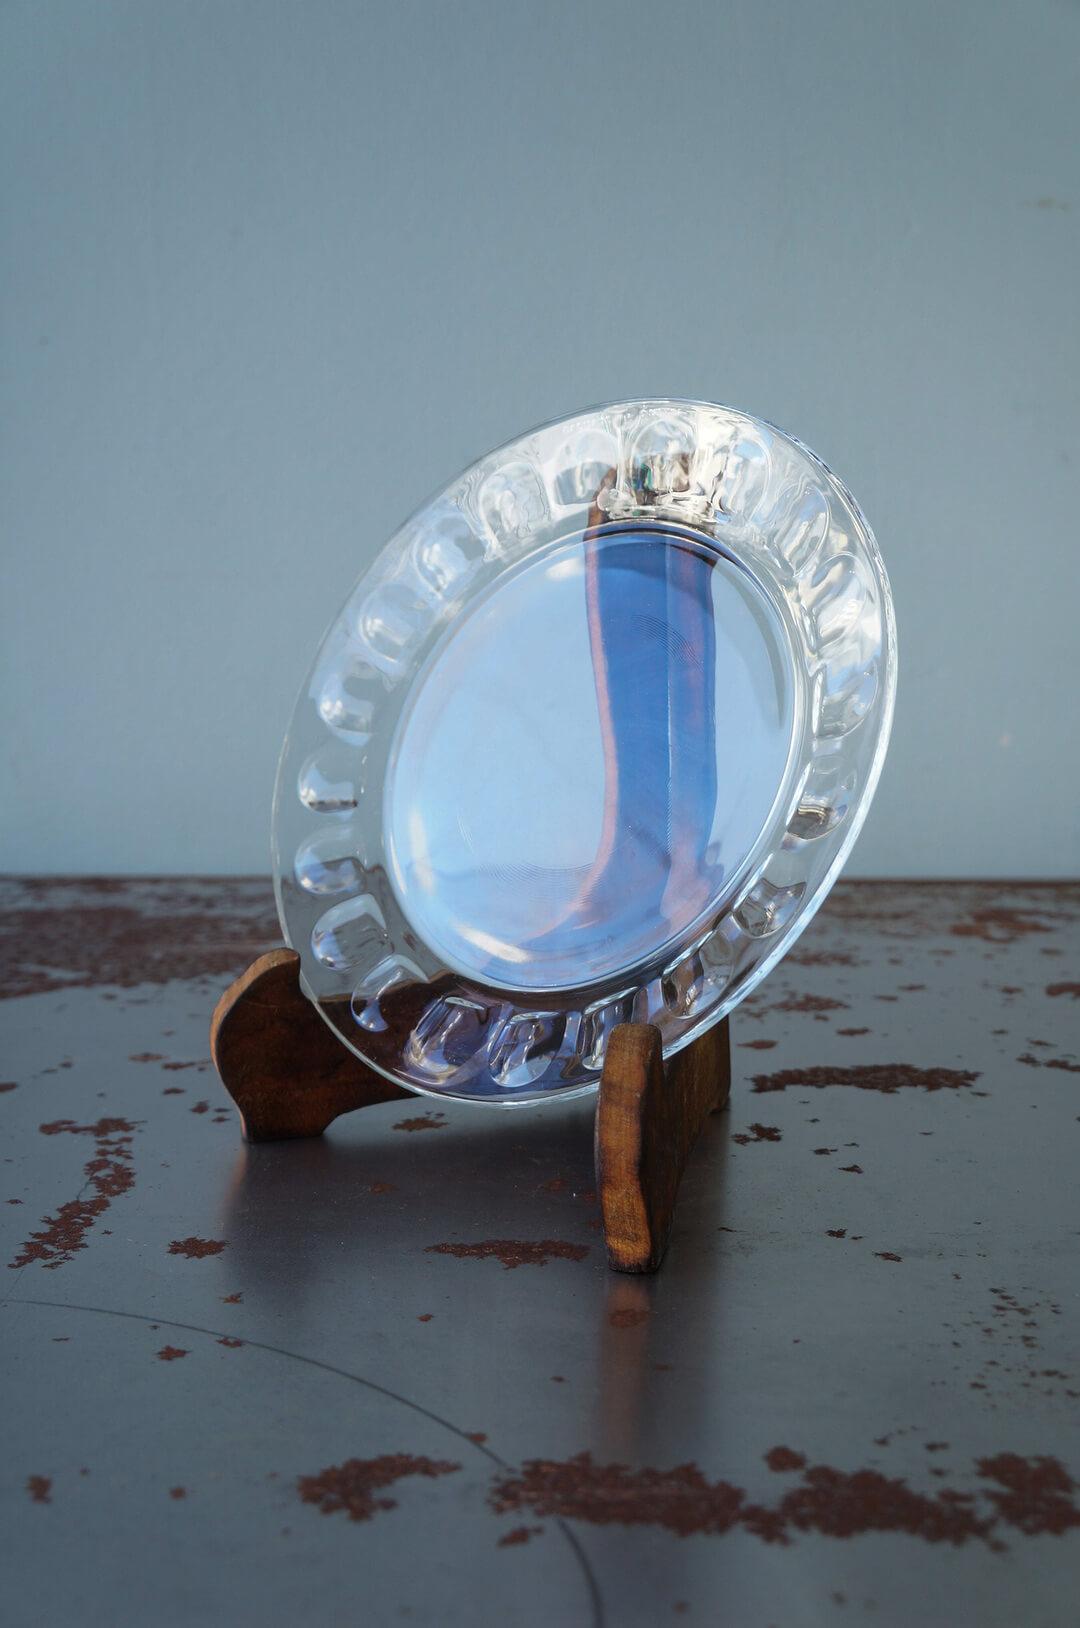 arcoroc Plate Glass Ware Made In France/アルコロック プレート ガラス フランス製 食器 レトロ スモールサイズ 3